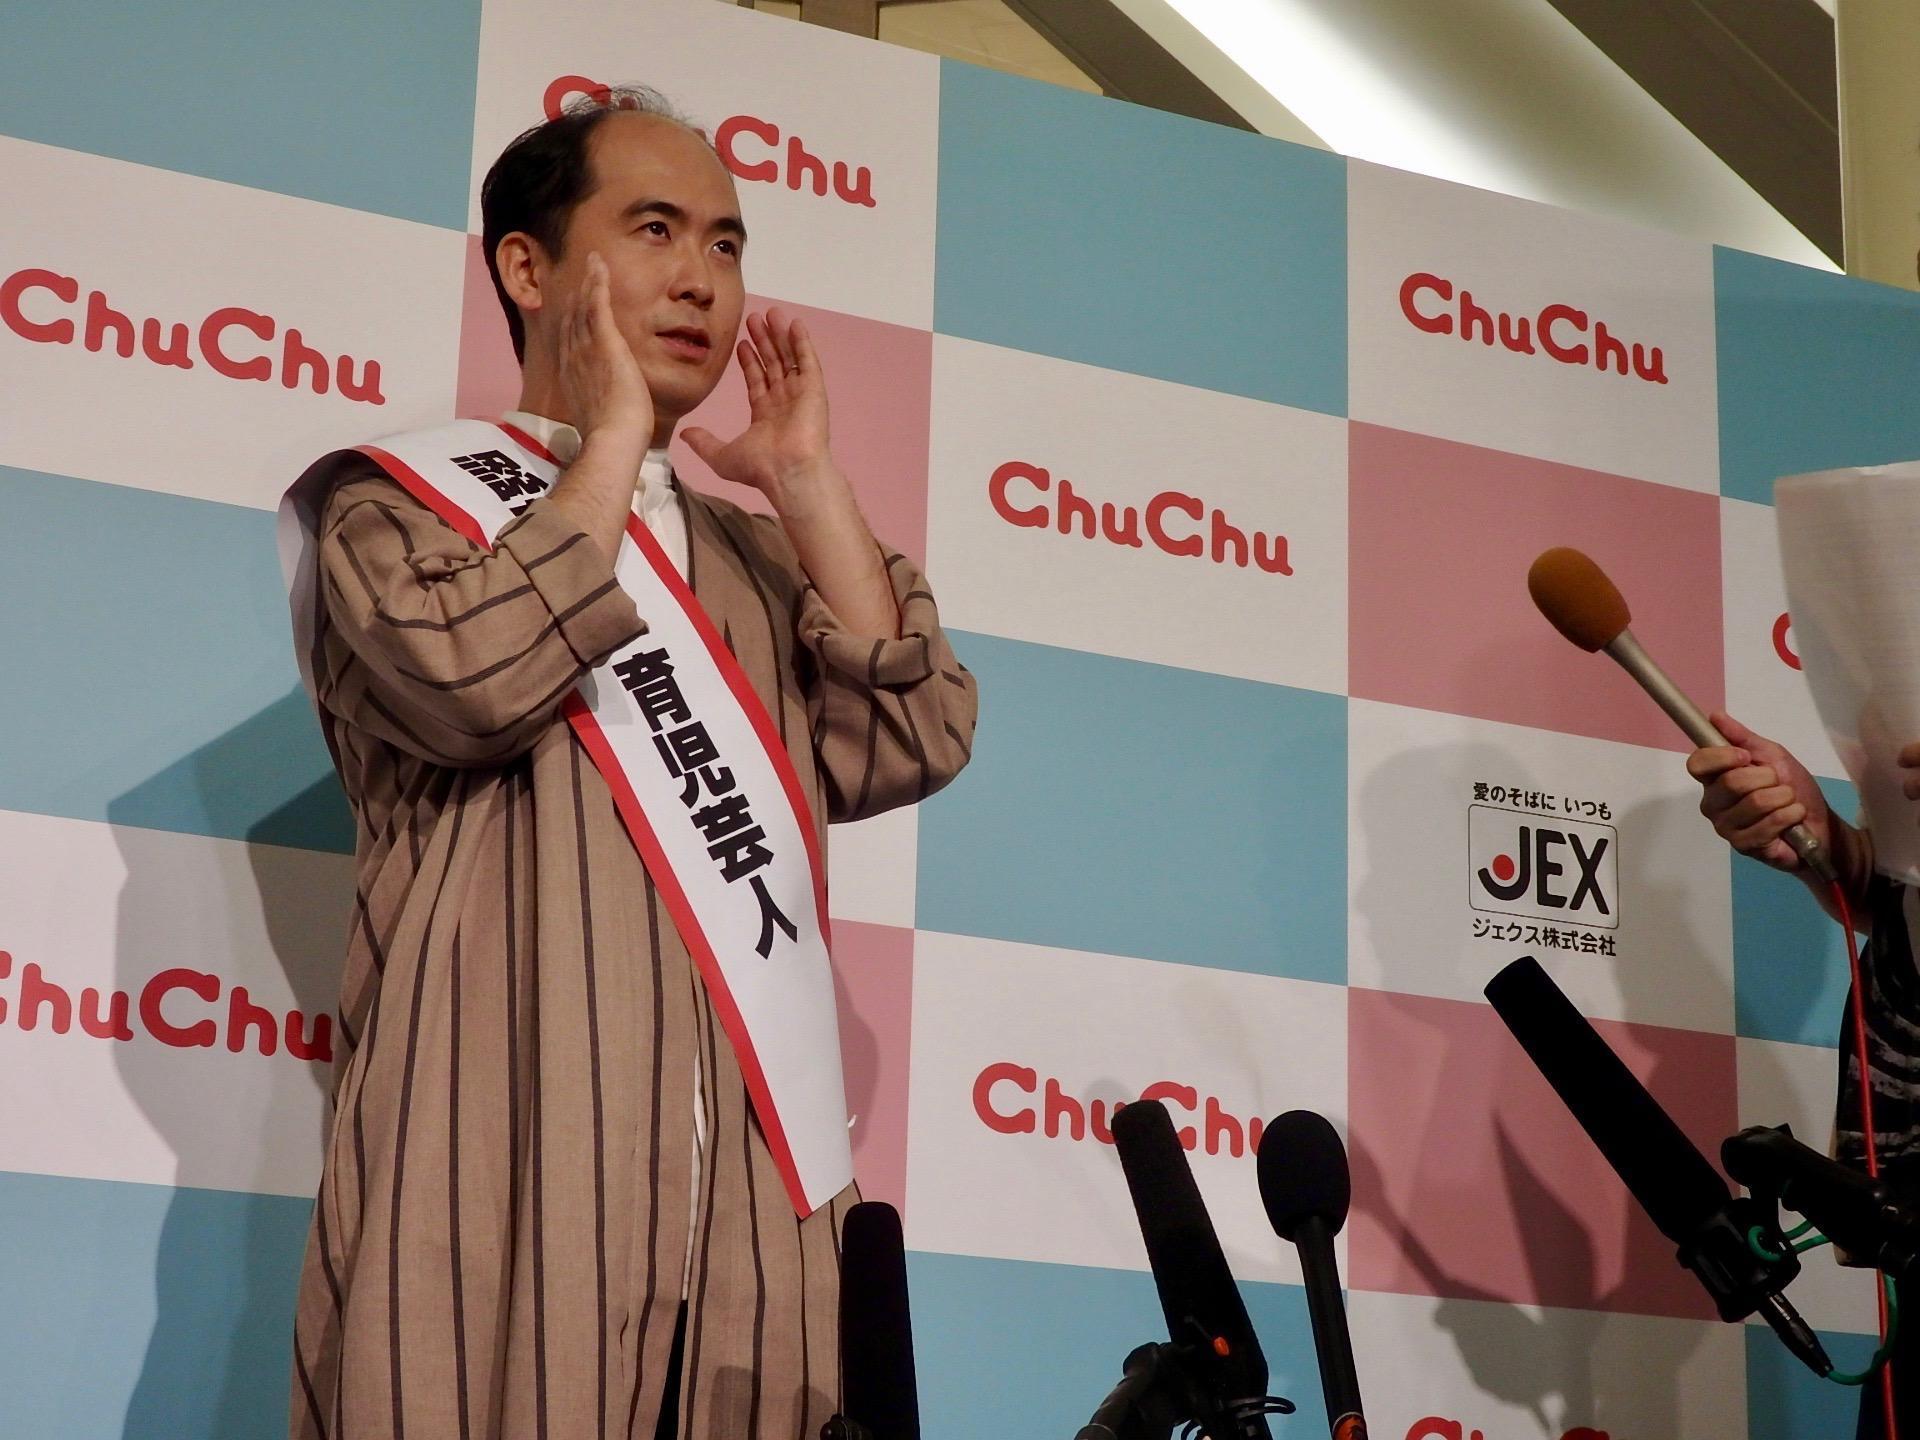 http://news.yoshimoto.co.jp/20180929174352-f829f8e604a400406e7f33eeefc7a28a546512bd.jpg